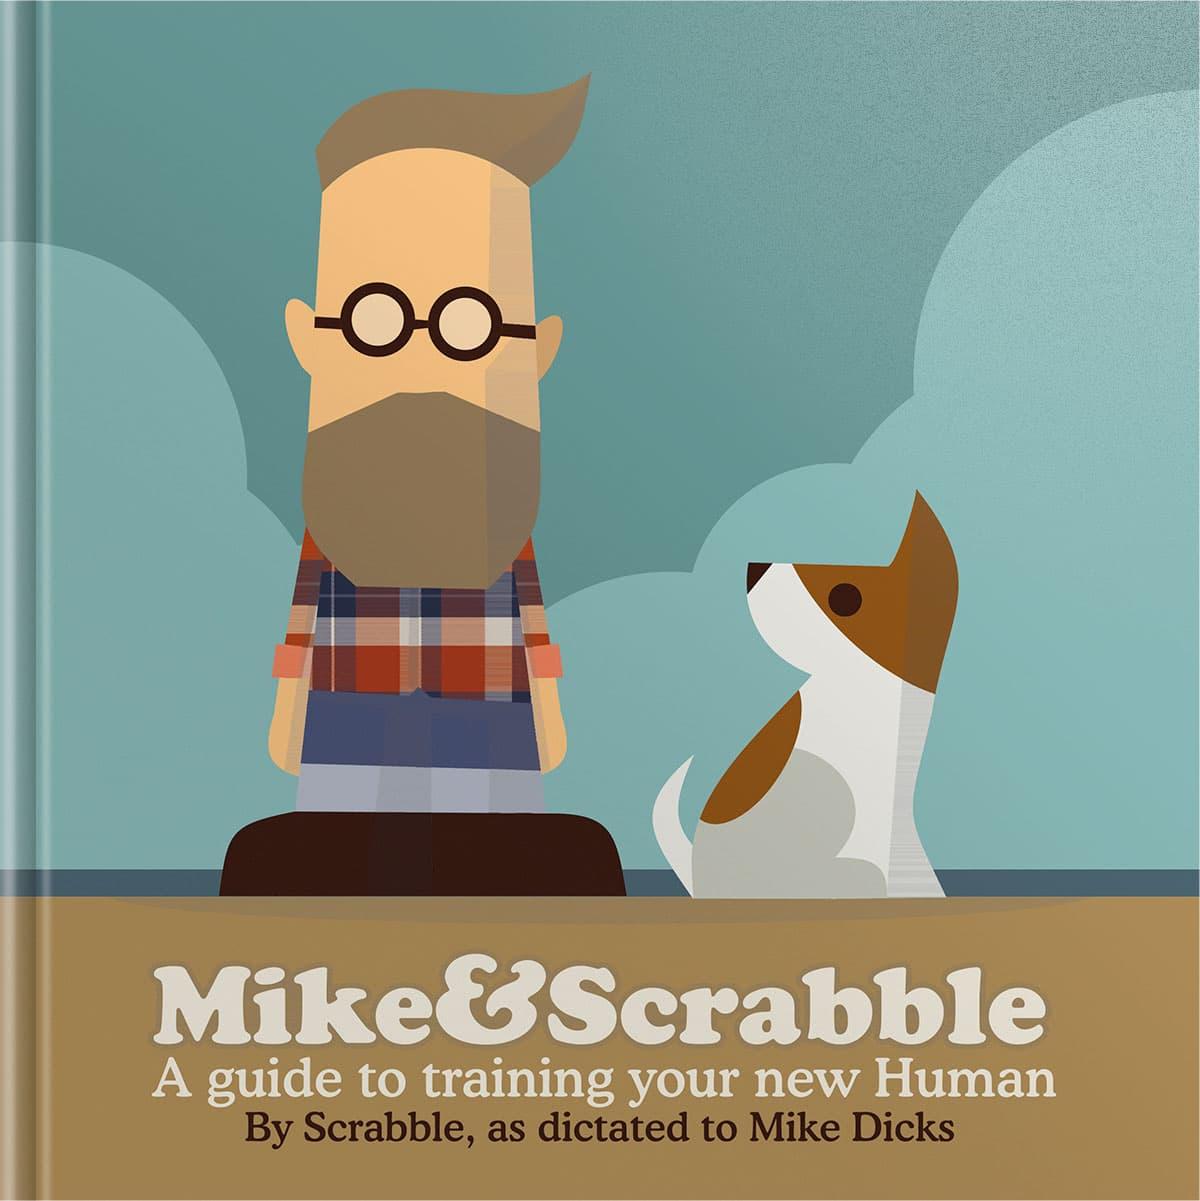 Mike & Scrabble